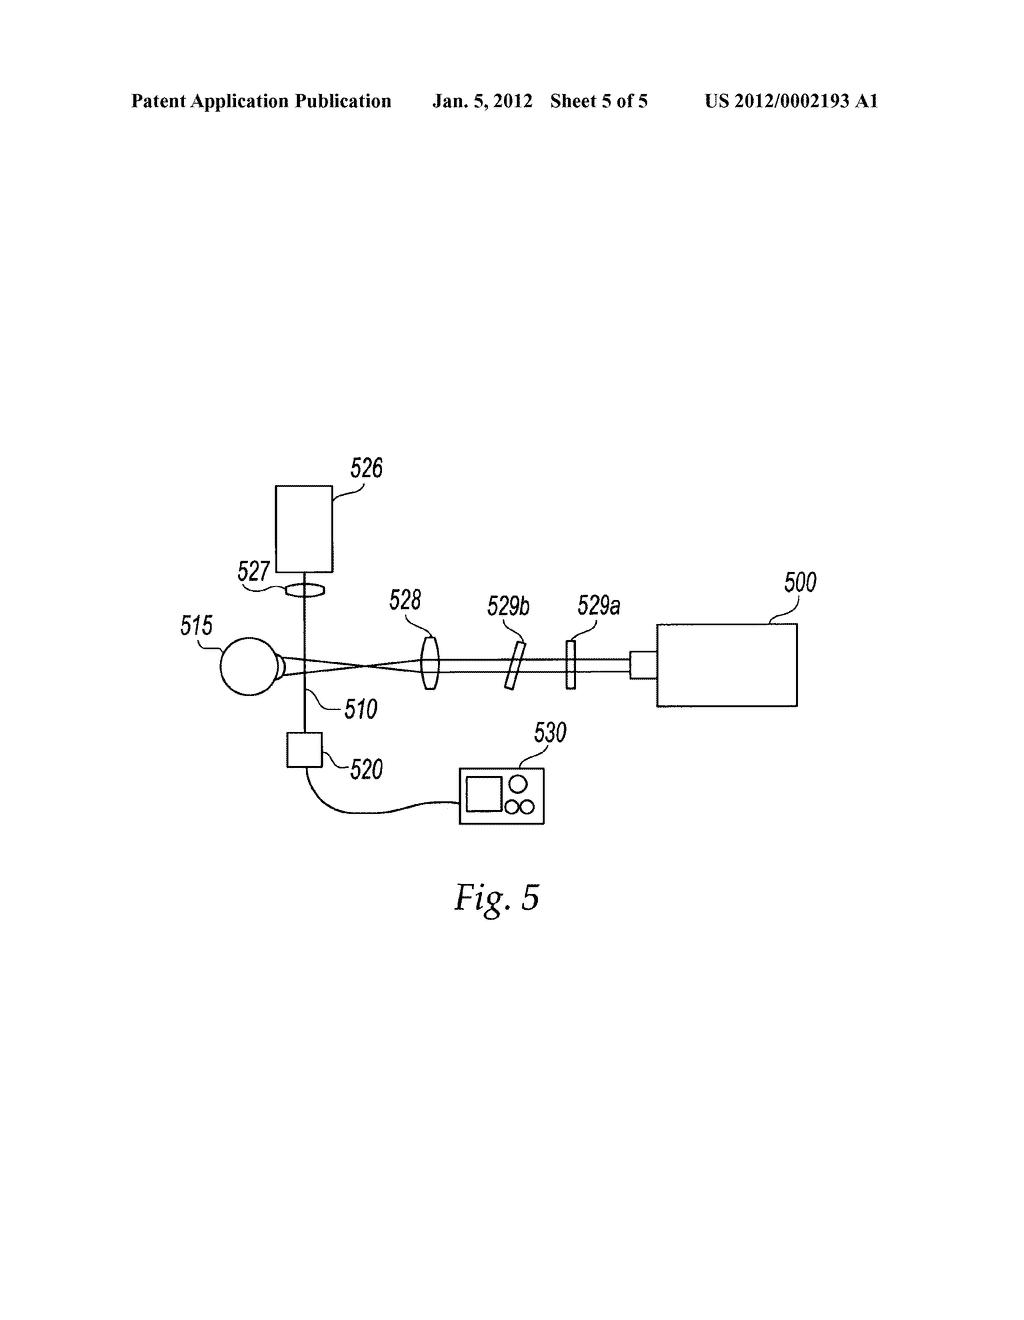 Photoacoustic Joulemeter Utilizing Beam Deflection Technique Diagram Schematic And Image 06